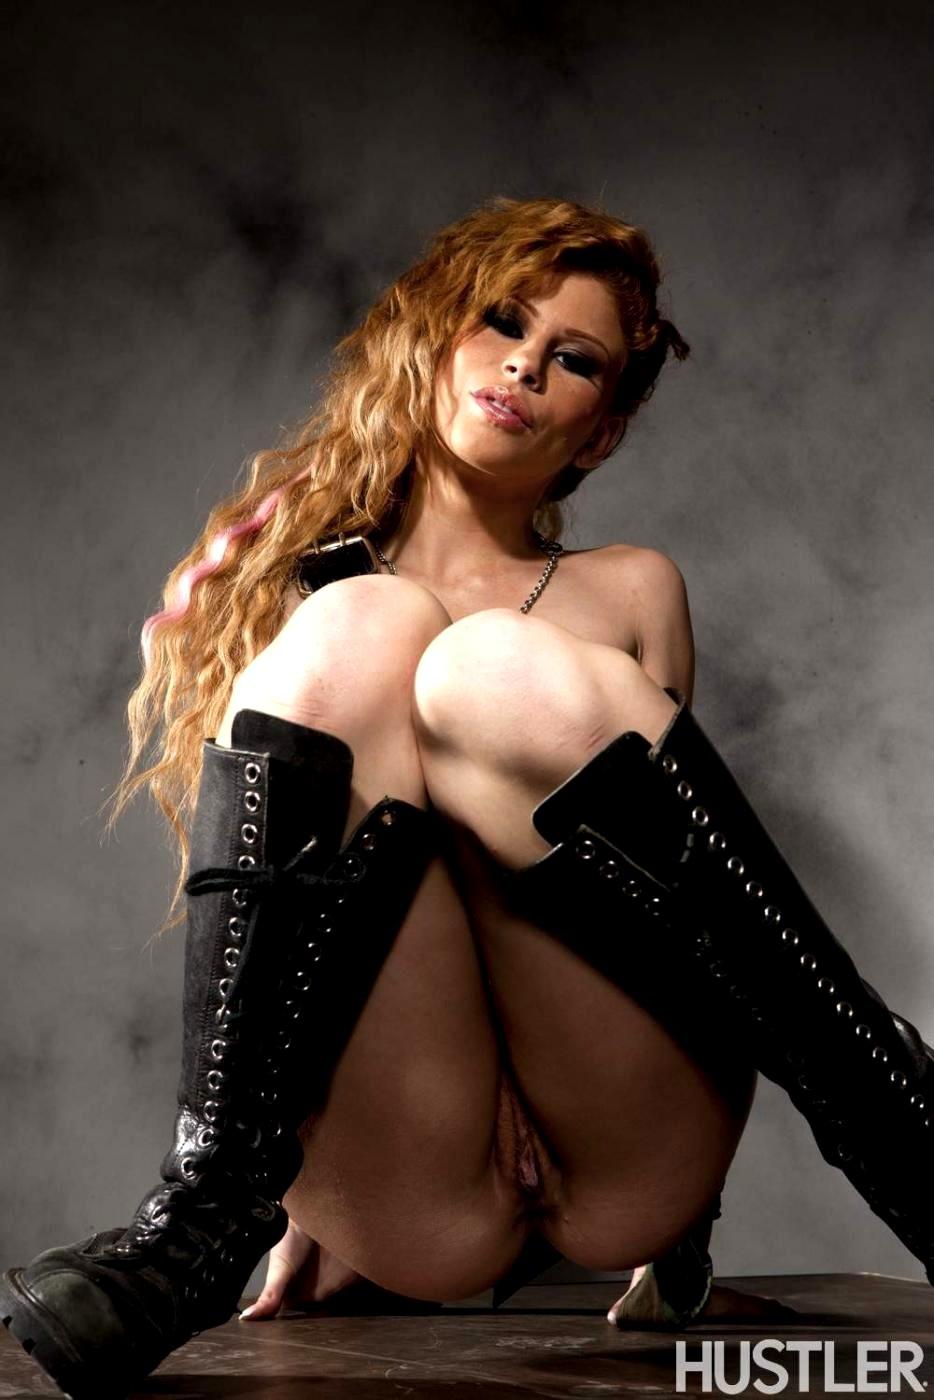 Incest! Brooklyn bondage model